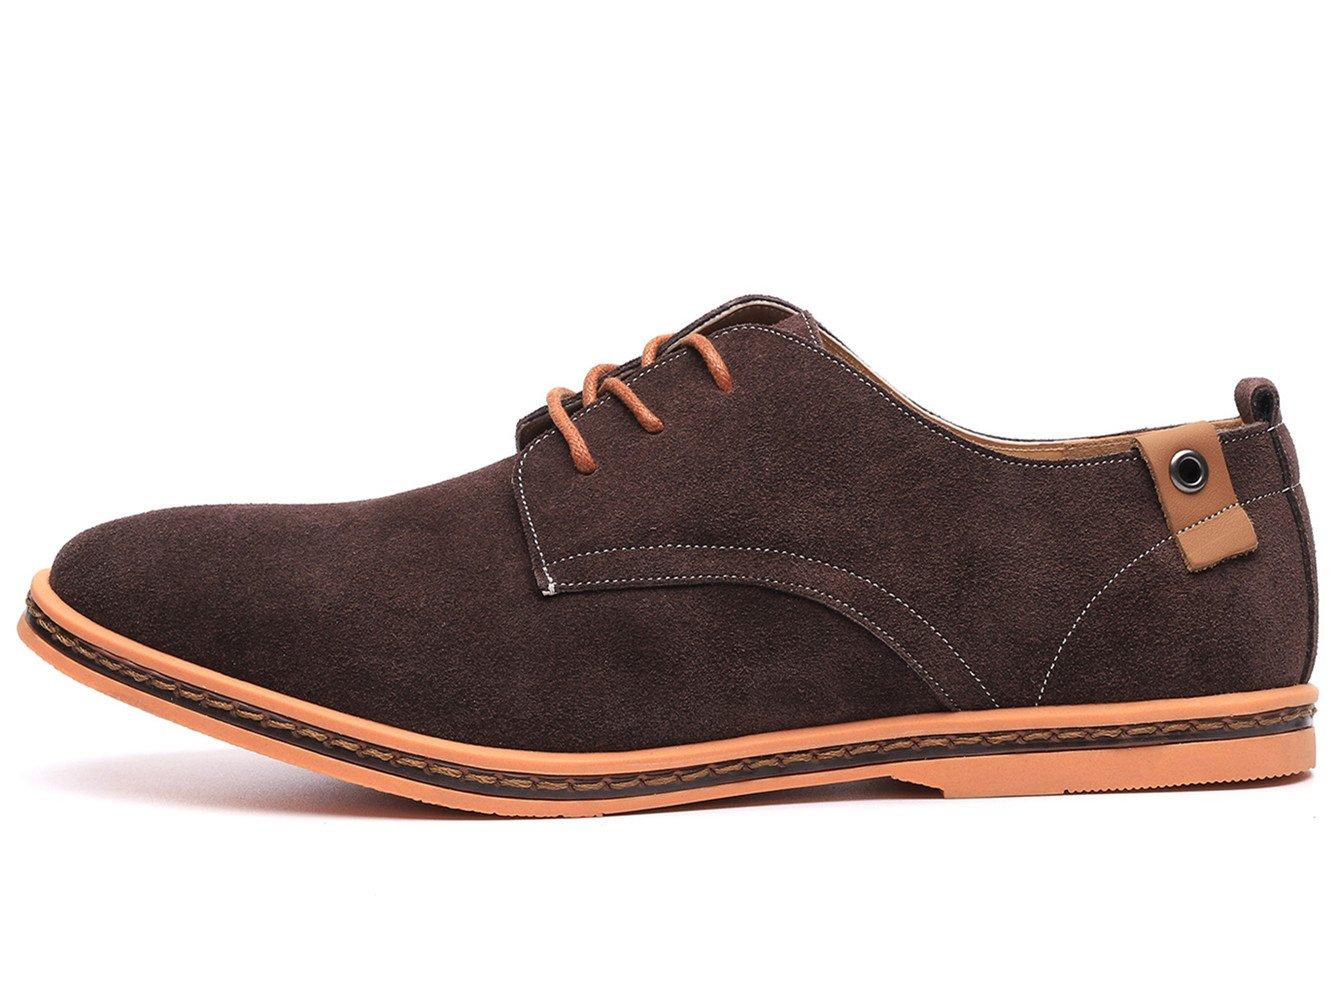 Dadawen Men's Brown Leather Oxford Shoe - 11 D(M) US by DADAWEN (Image #4)